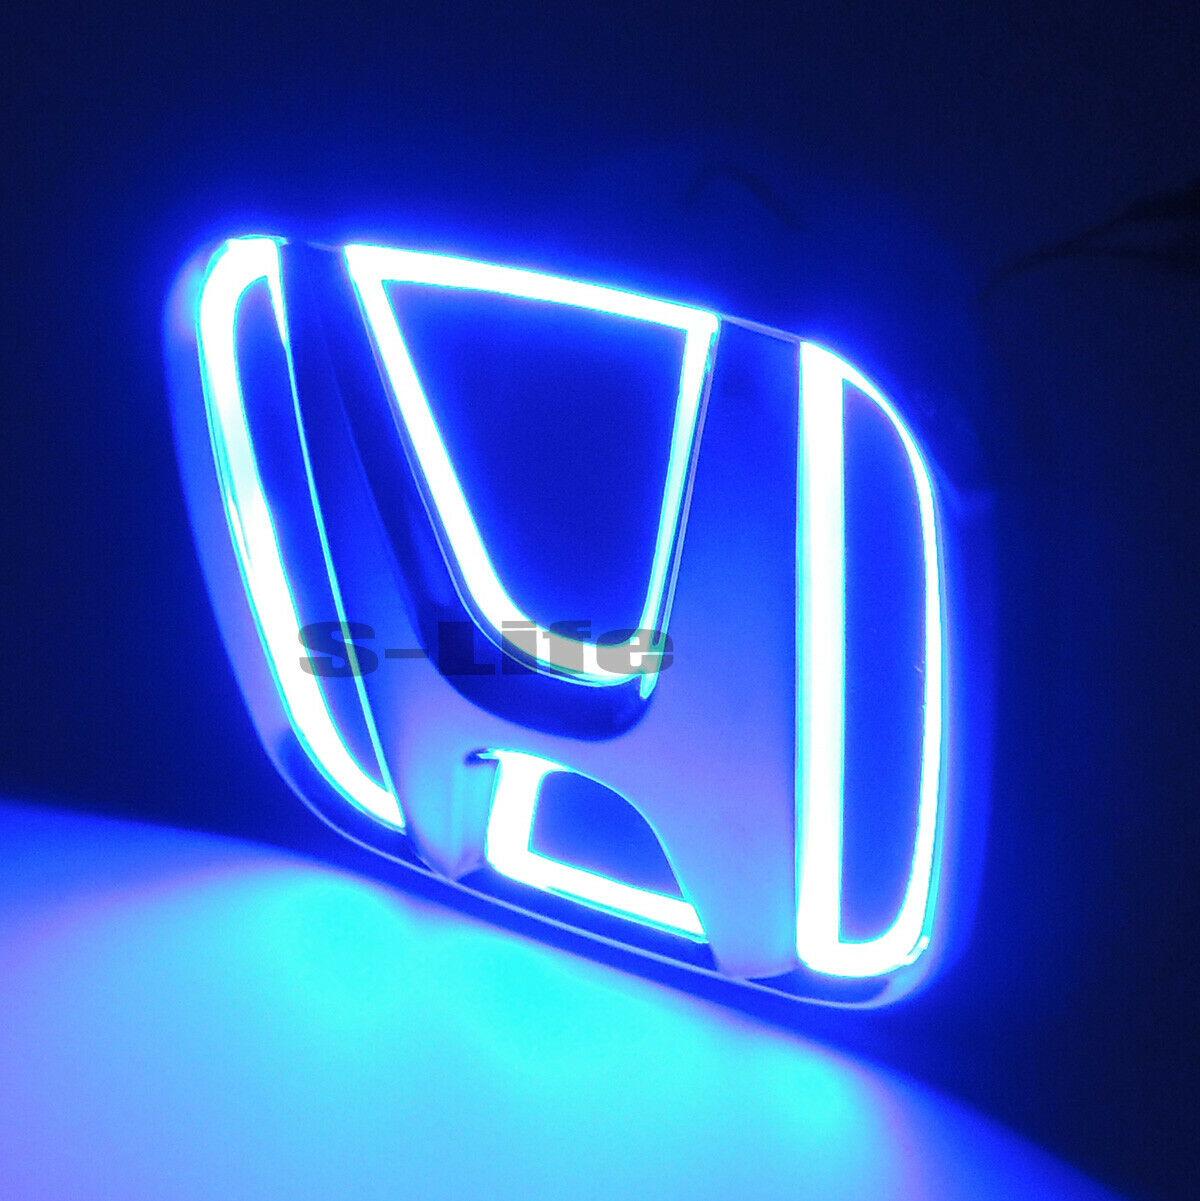 Details about Blue Auto 5D LED Car Tail Logo Light Badge Emblem For Honda  New FIt 09.